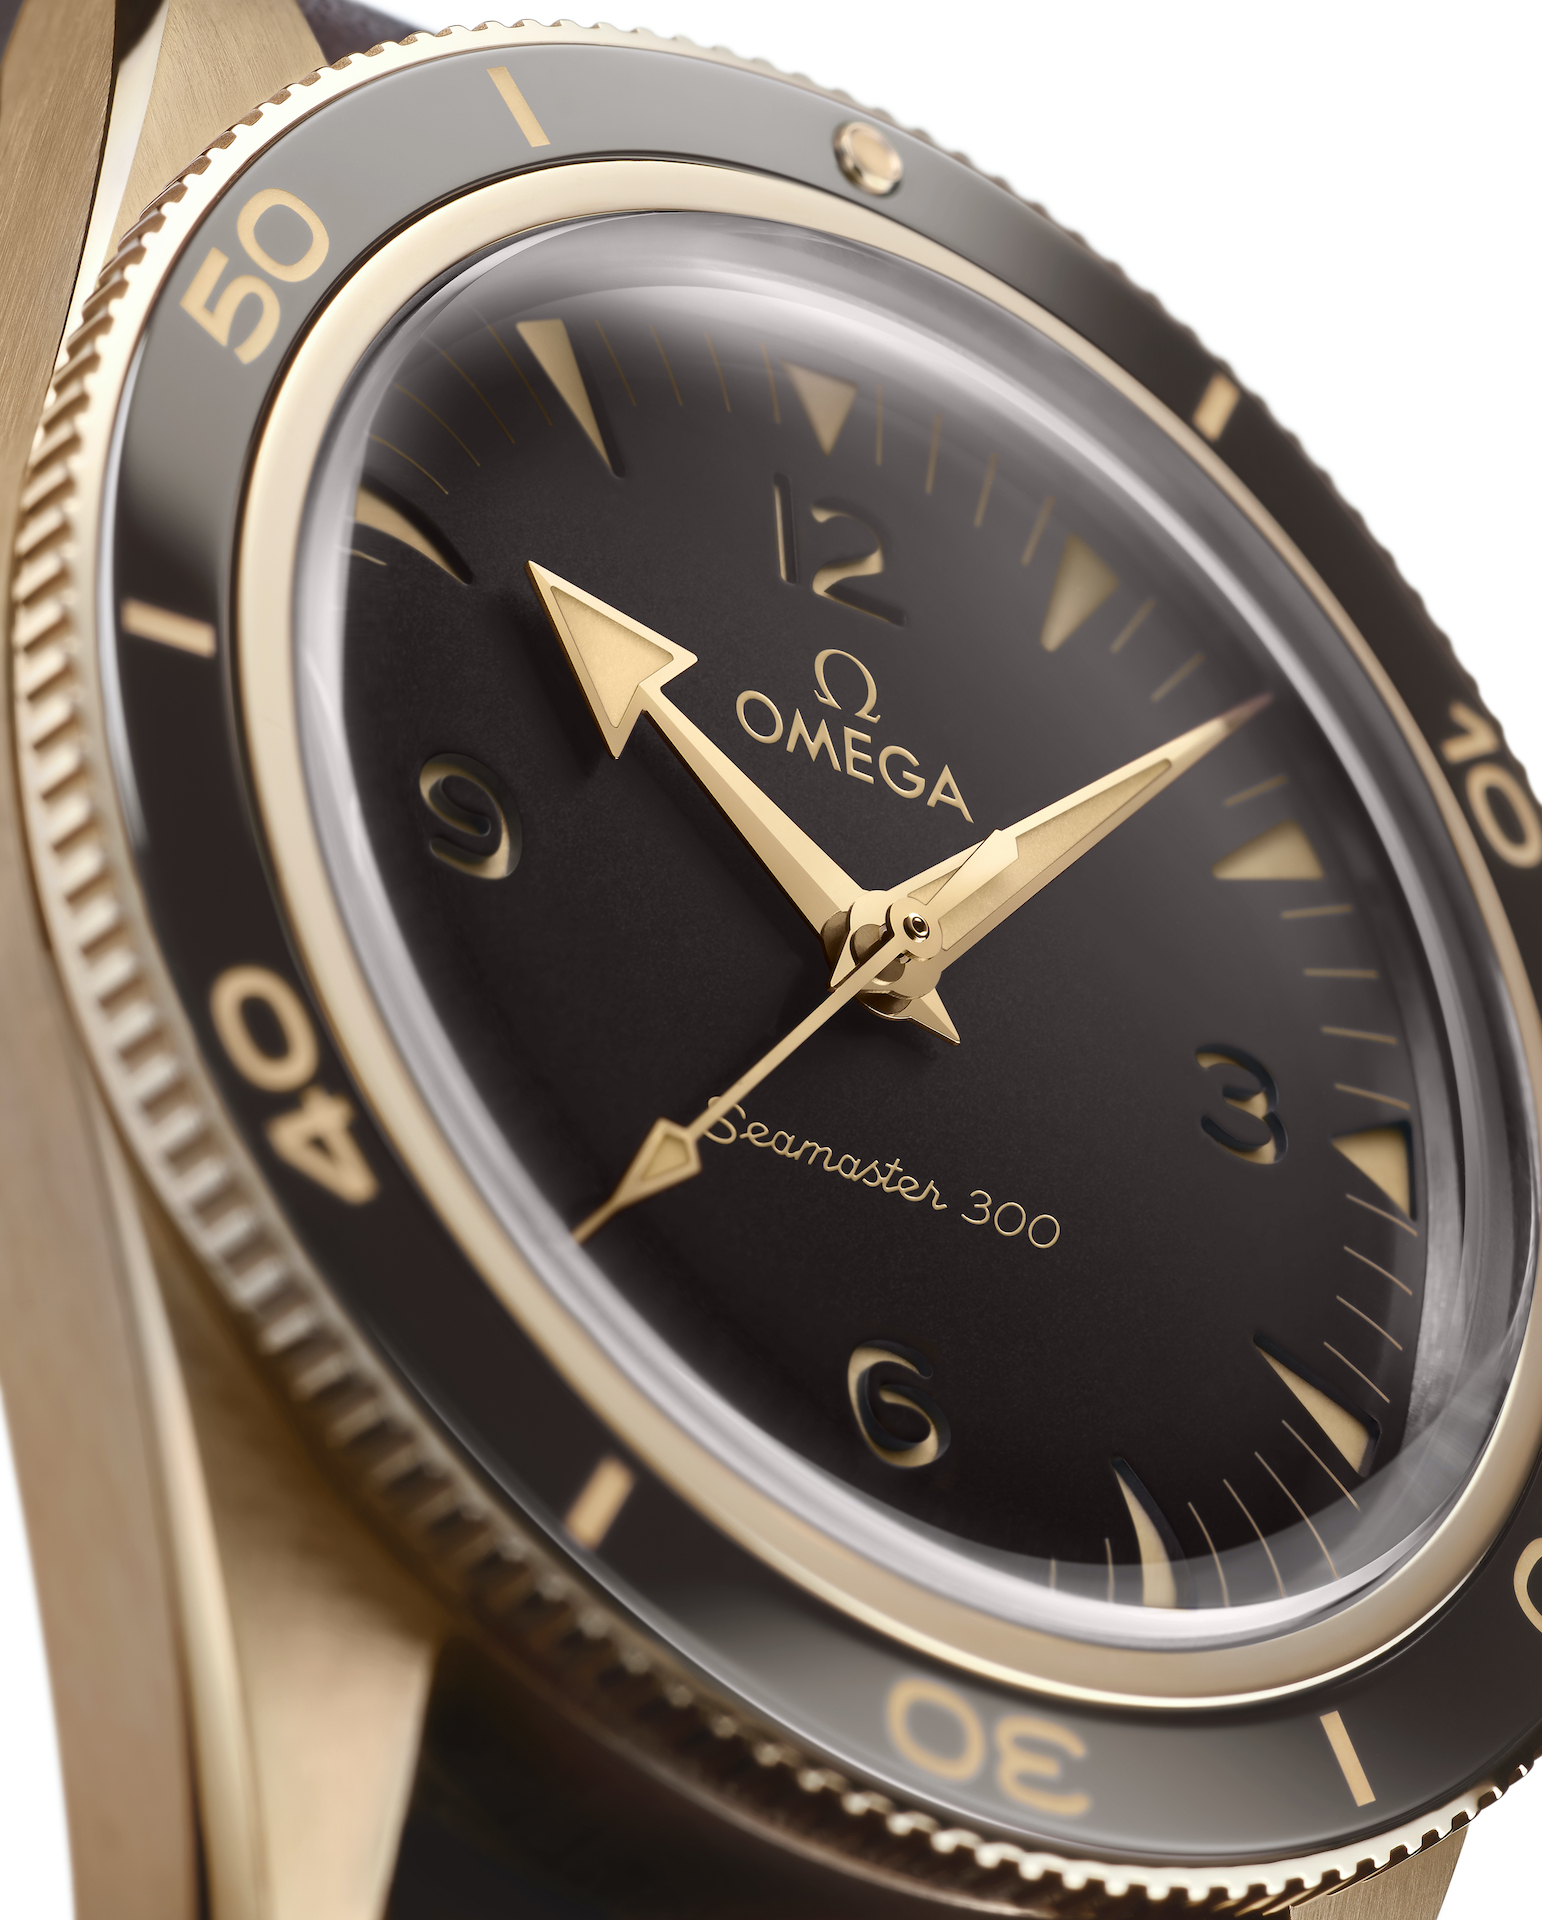 Omega Seamaster 300 Bronze-Gold